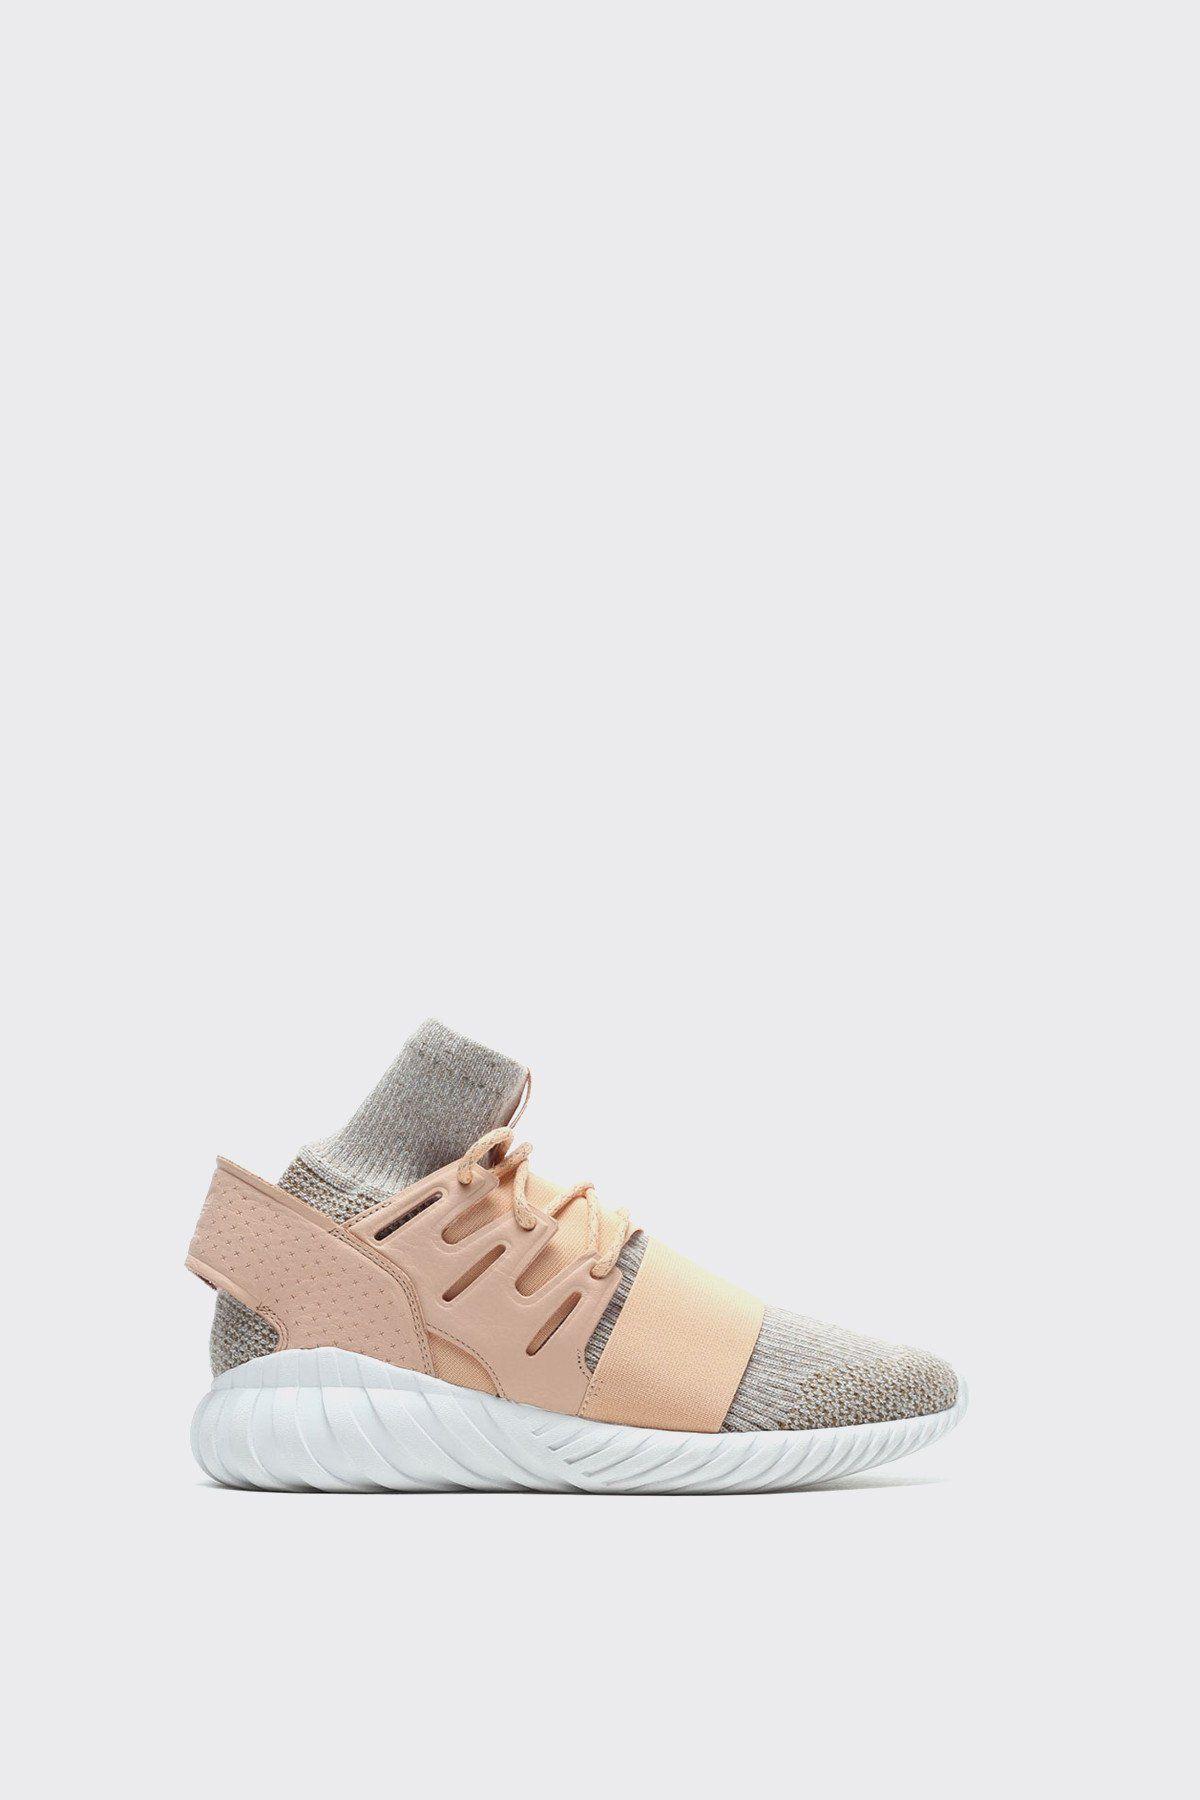 Incu tubulare doom pk femme pinterest cuoio scarpe adidas